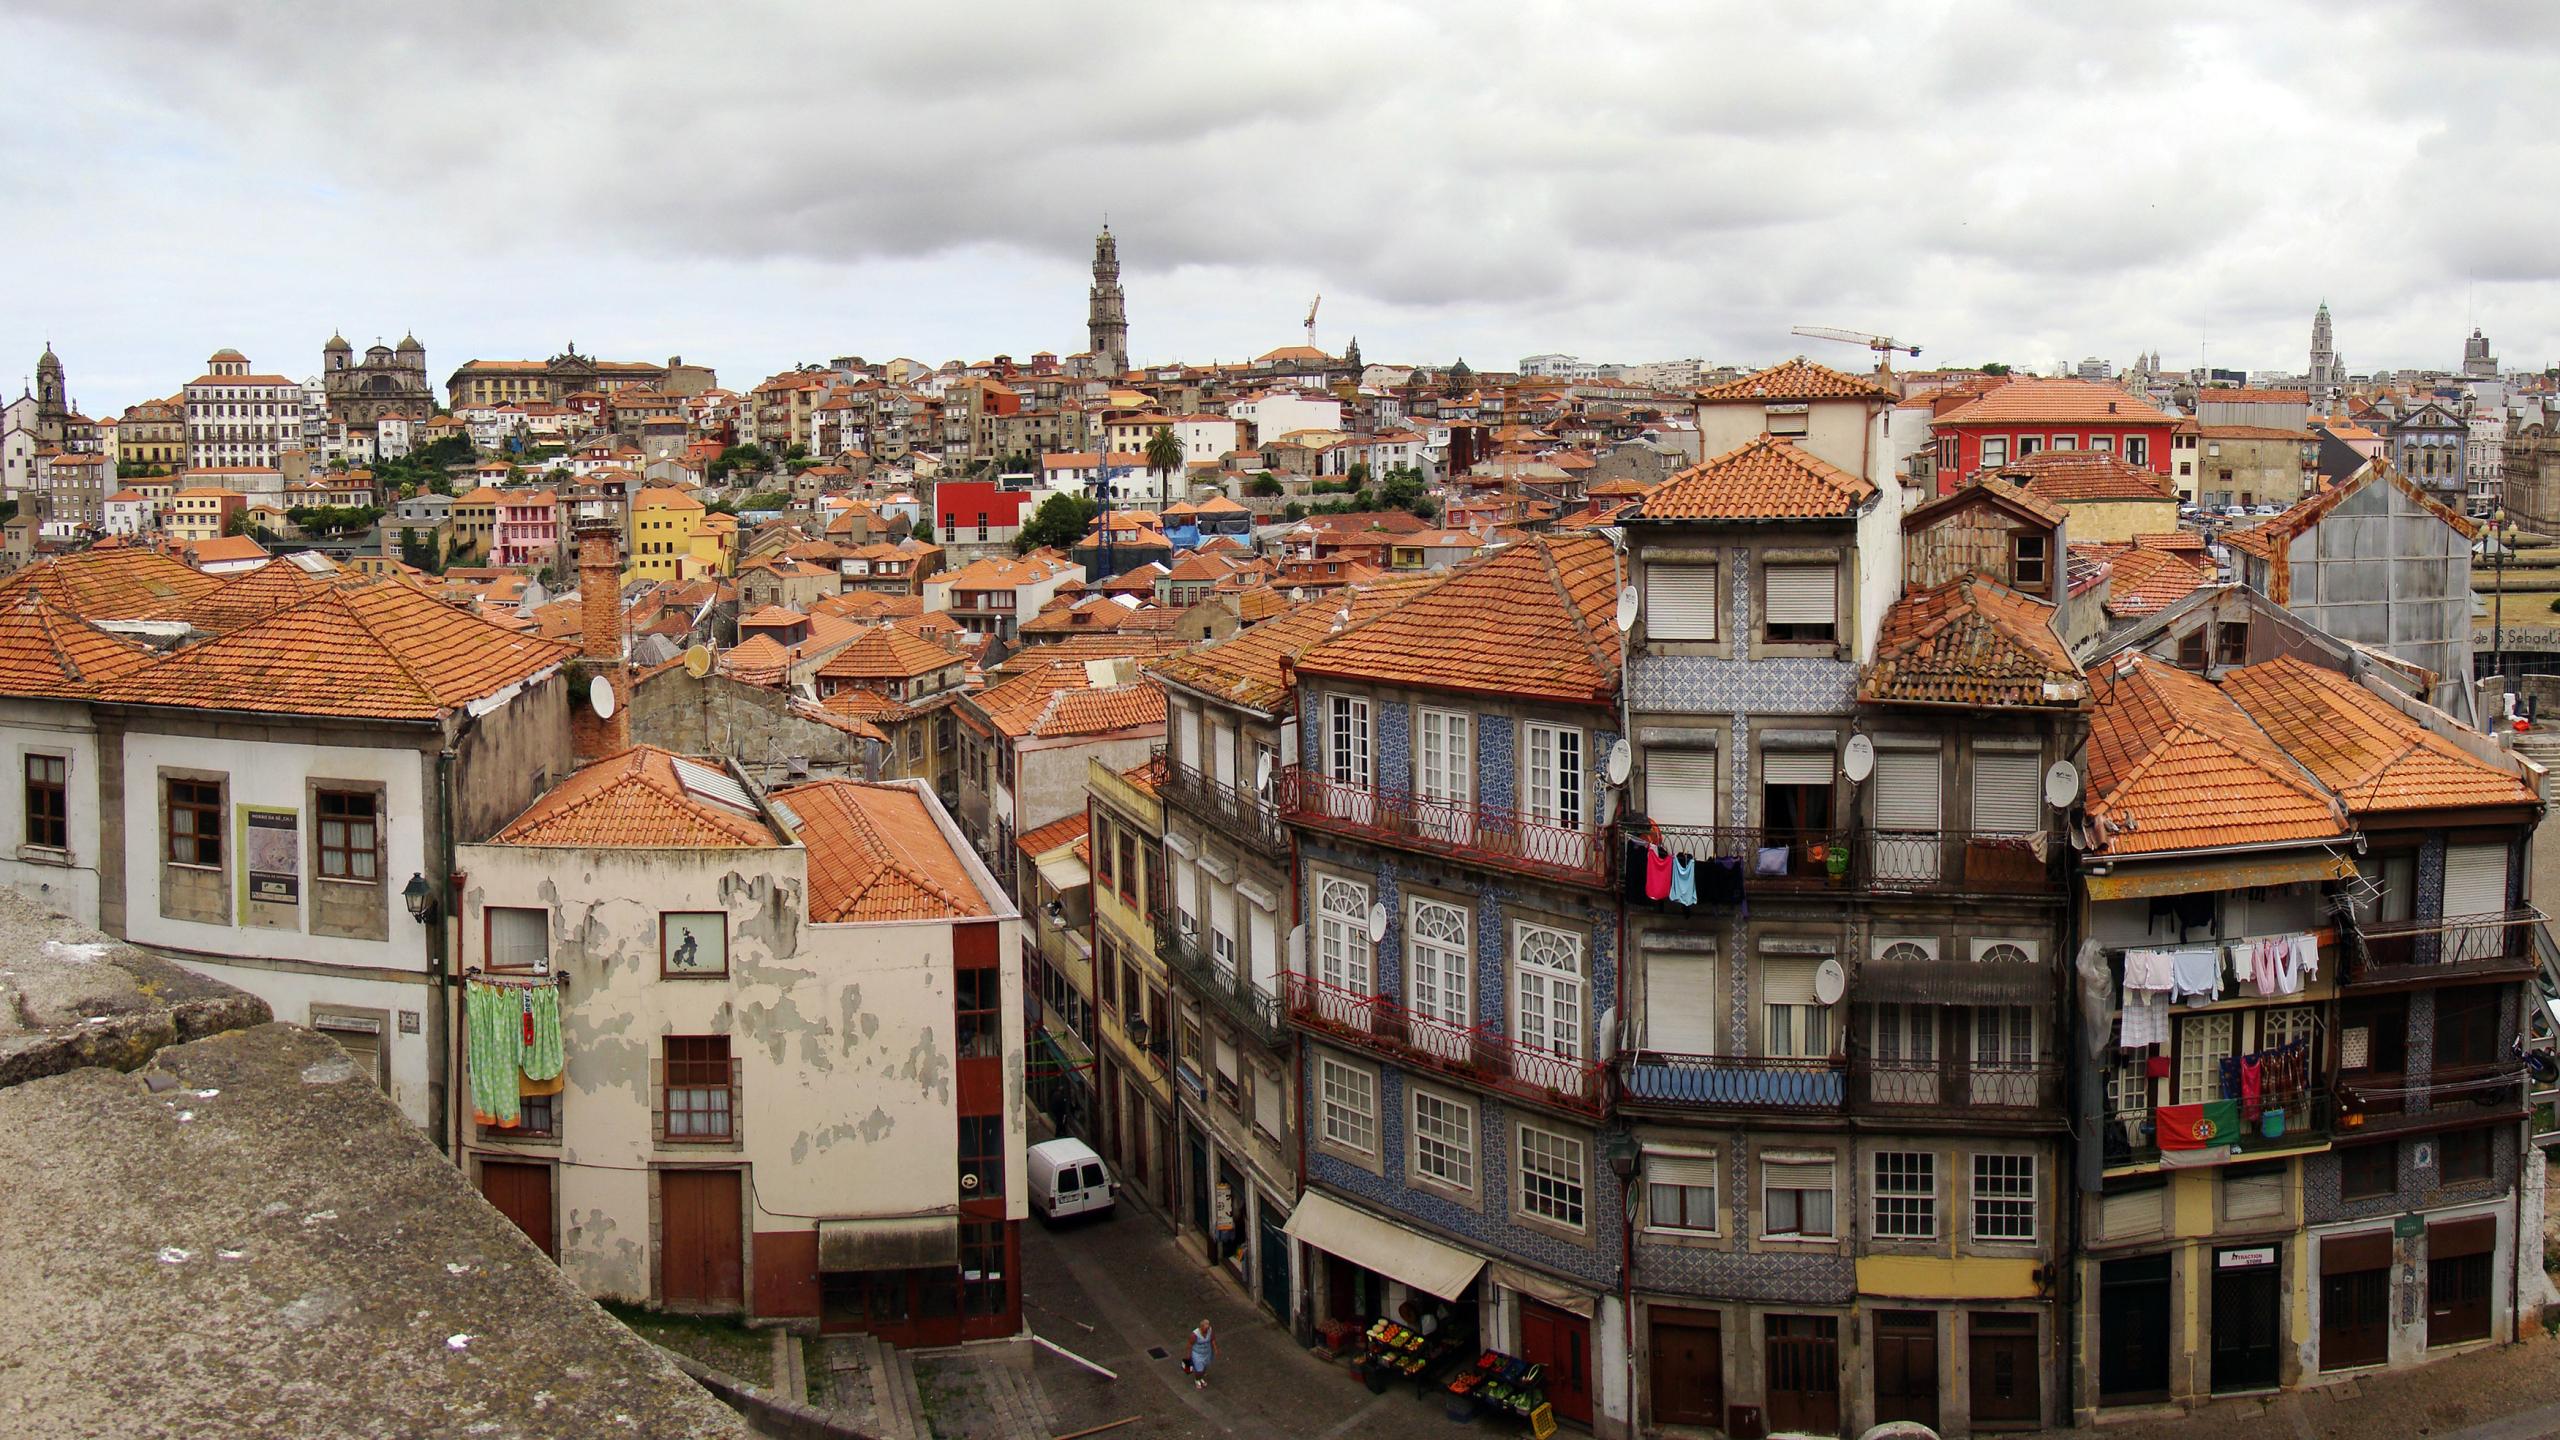 2560x1440 portugal, porto, old town 1440P Resolution ...